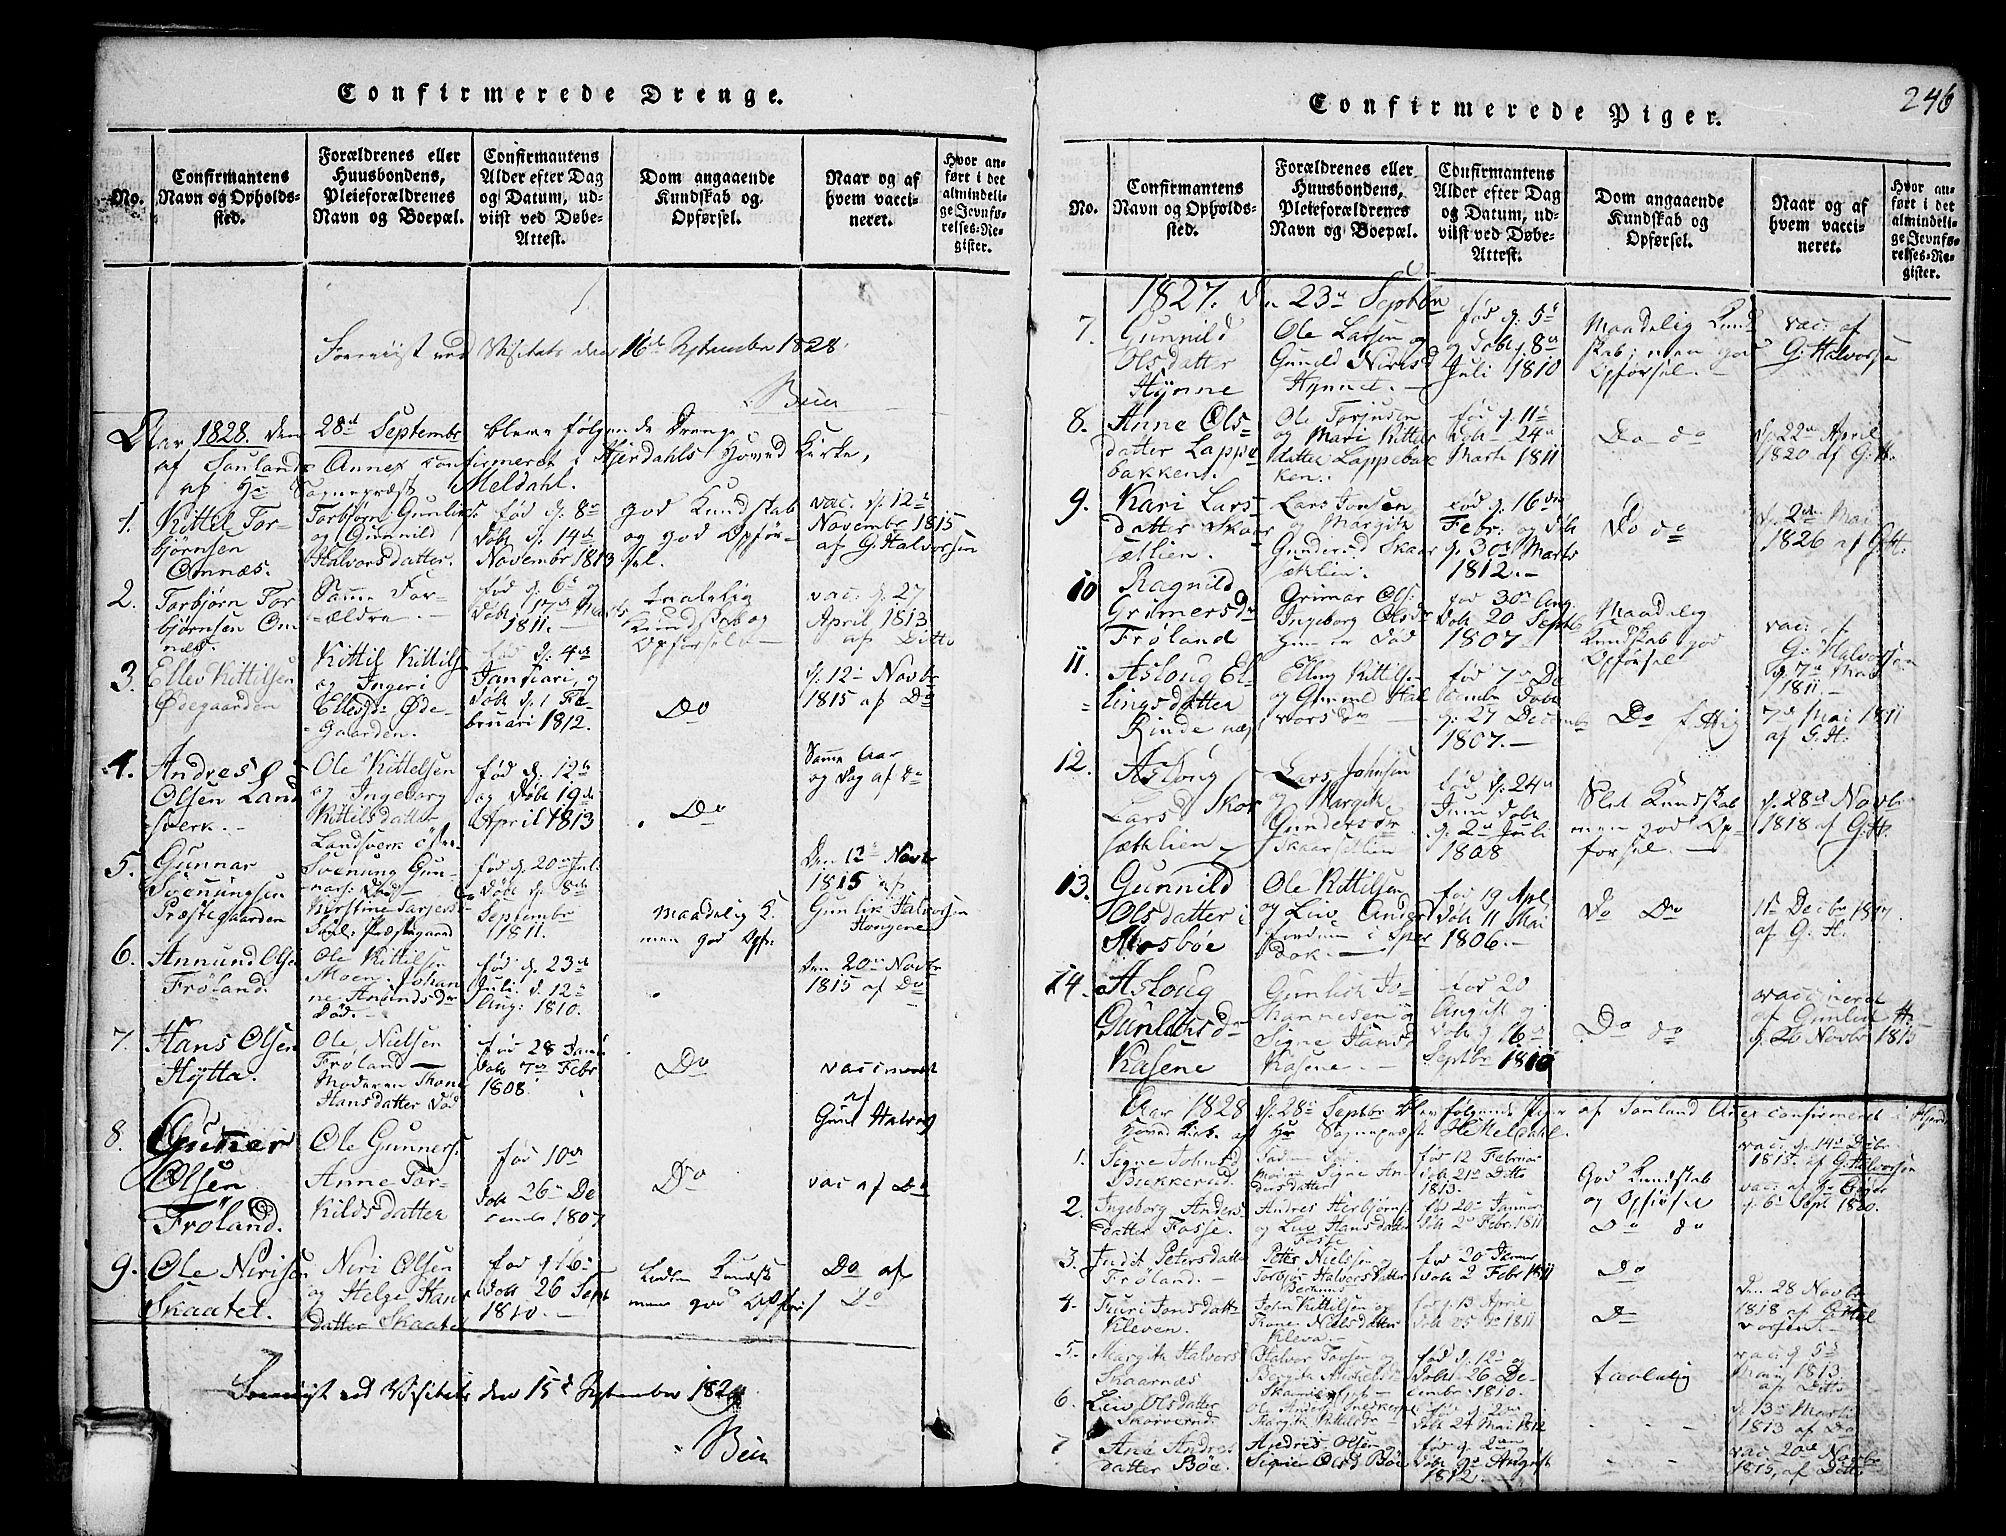 SAKO, Hjartdal kirkebøker, G/Gb/L0001: Klokkerbok nr. II 1, 1815-1842, s. 246